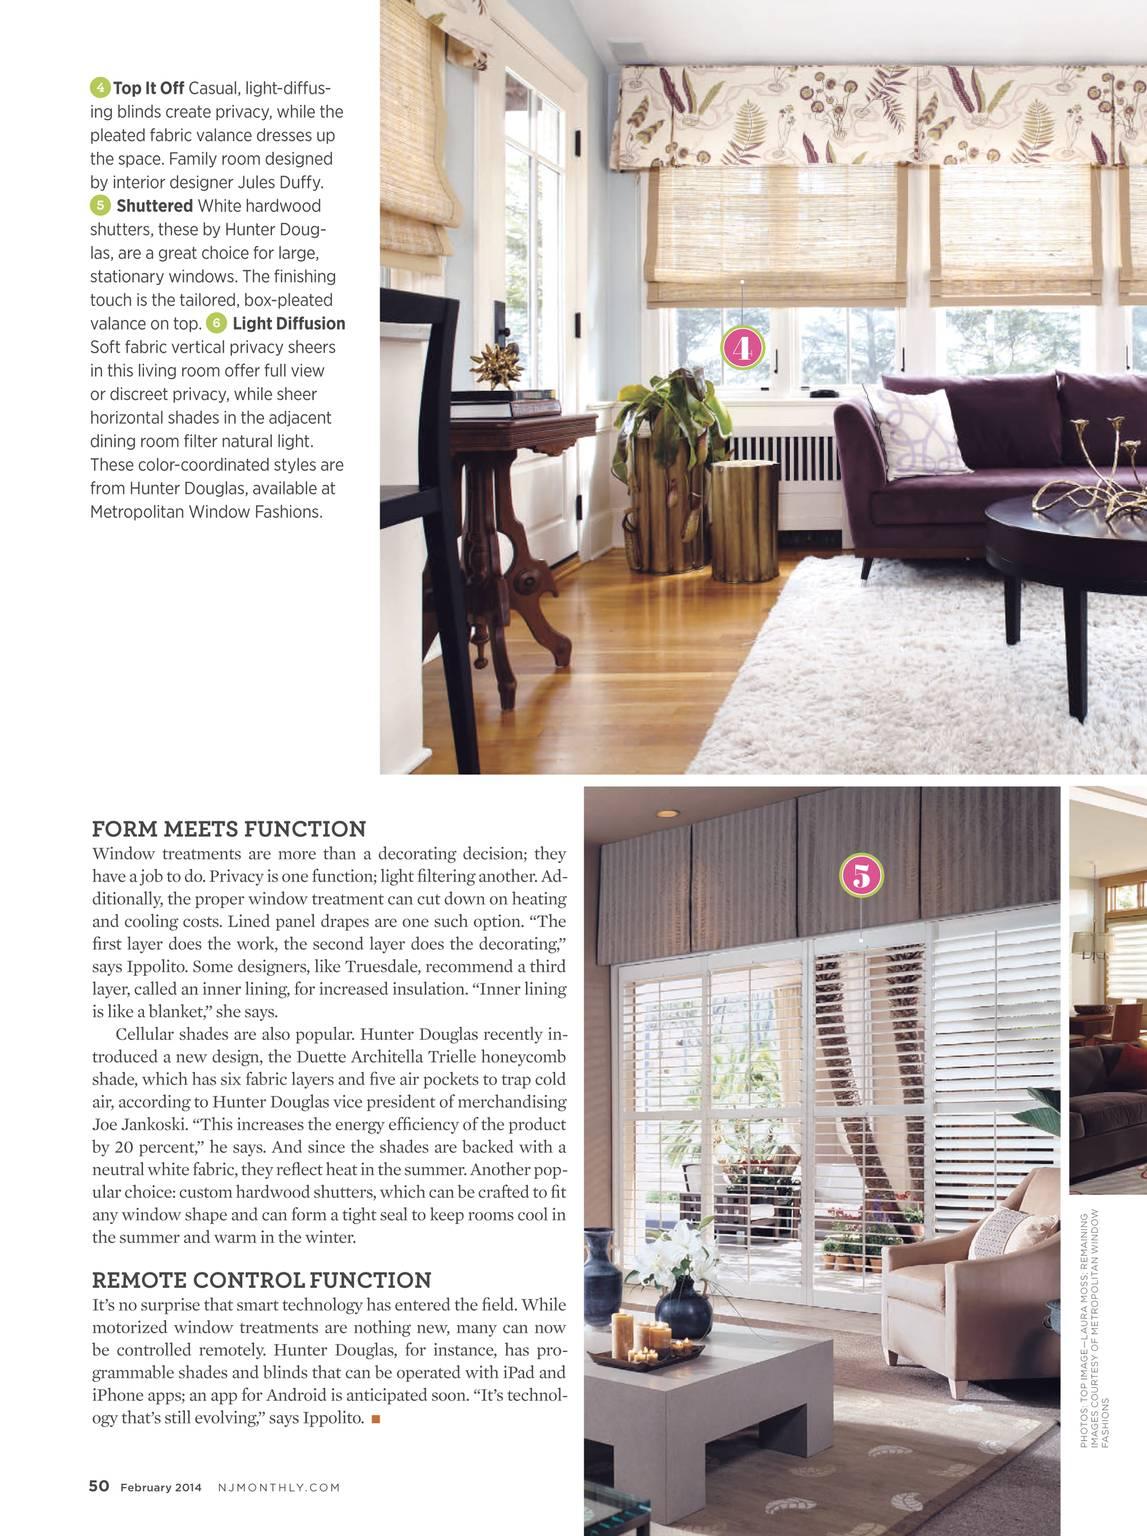 metropolitan window fashions window treatments page 50 nj monthly february 2014 page 49